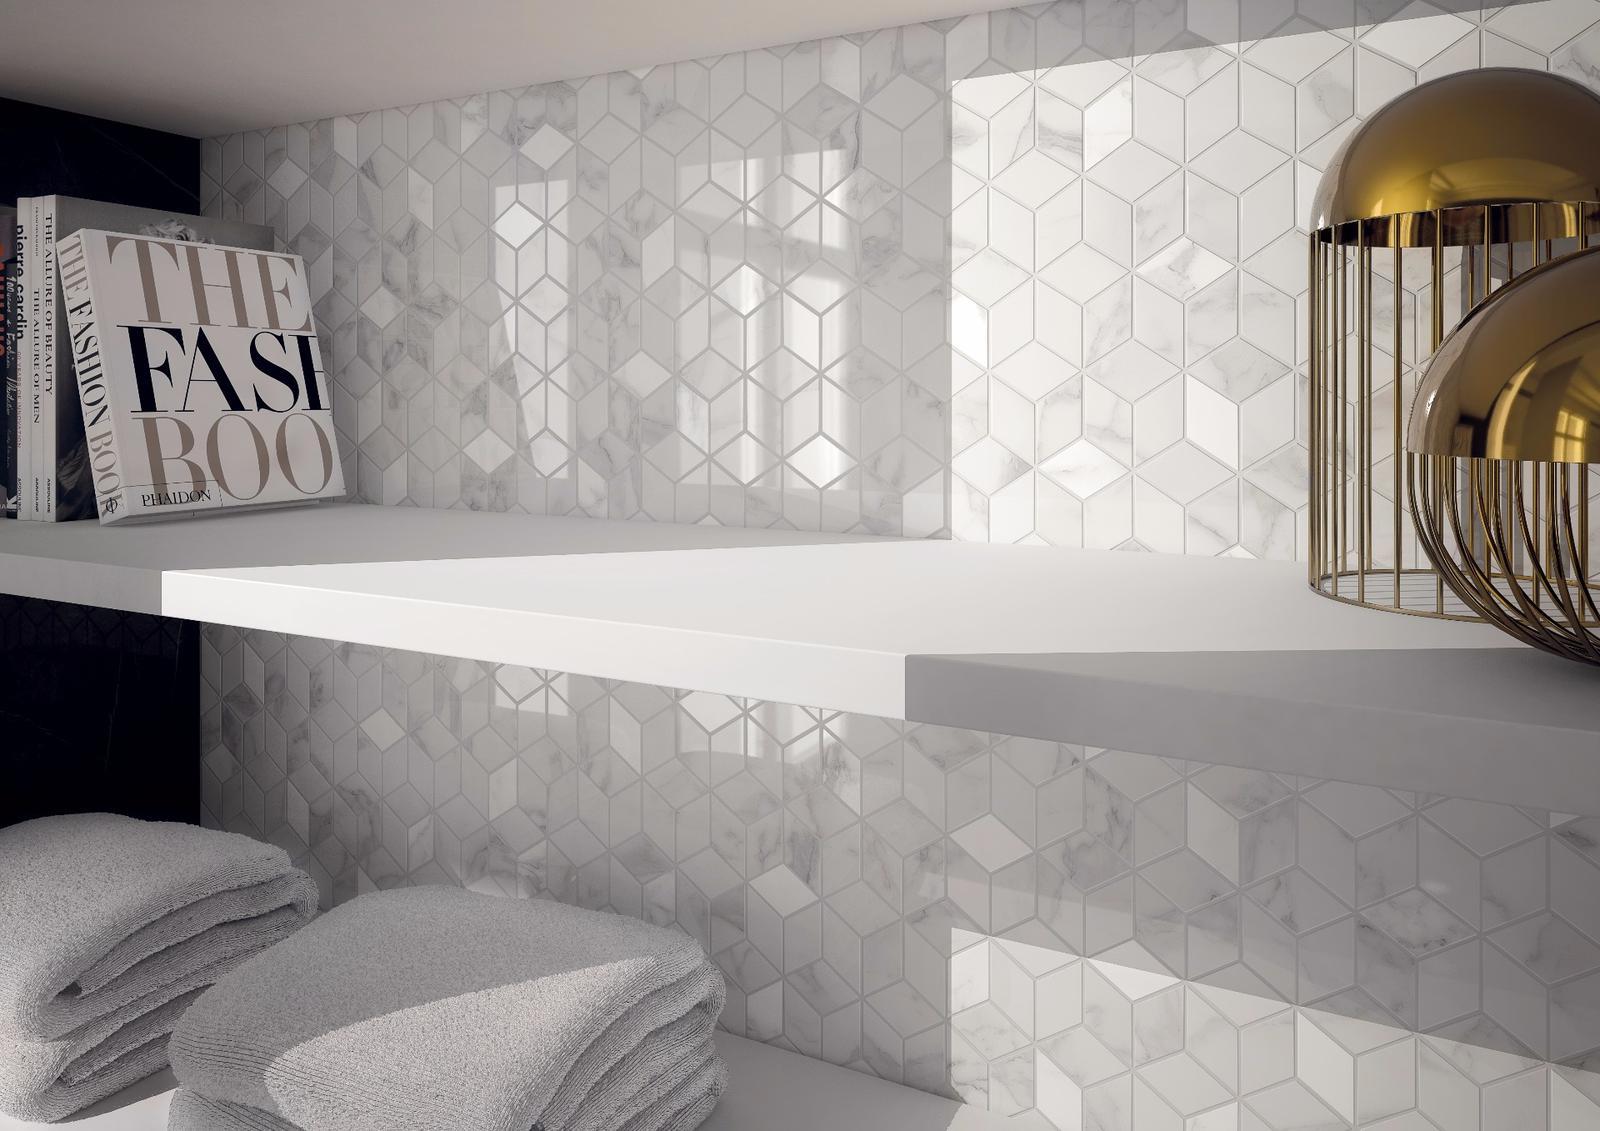 Keramické mozaiky - Mozaika DeLuxe - www.beneva.sk/mozaika